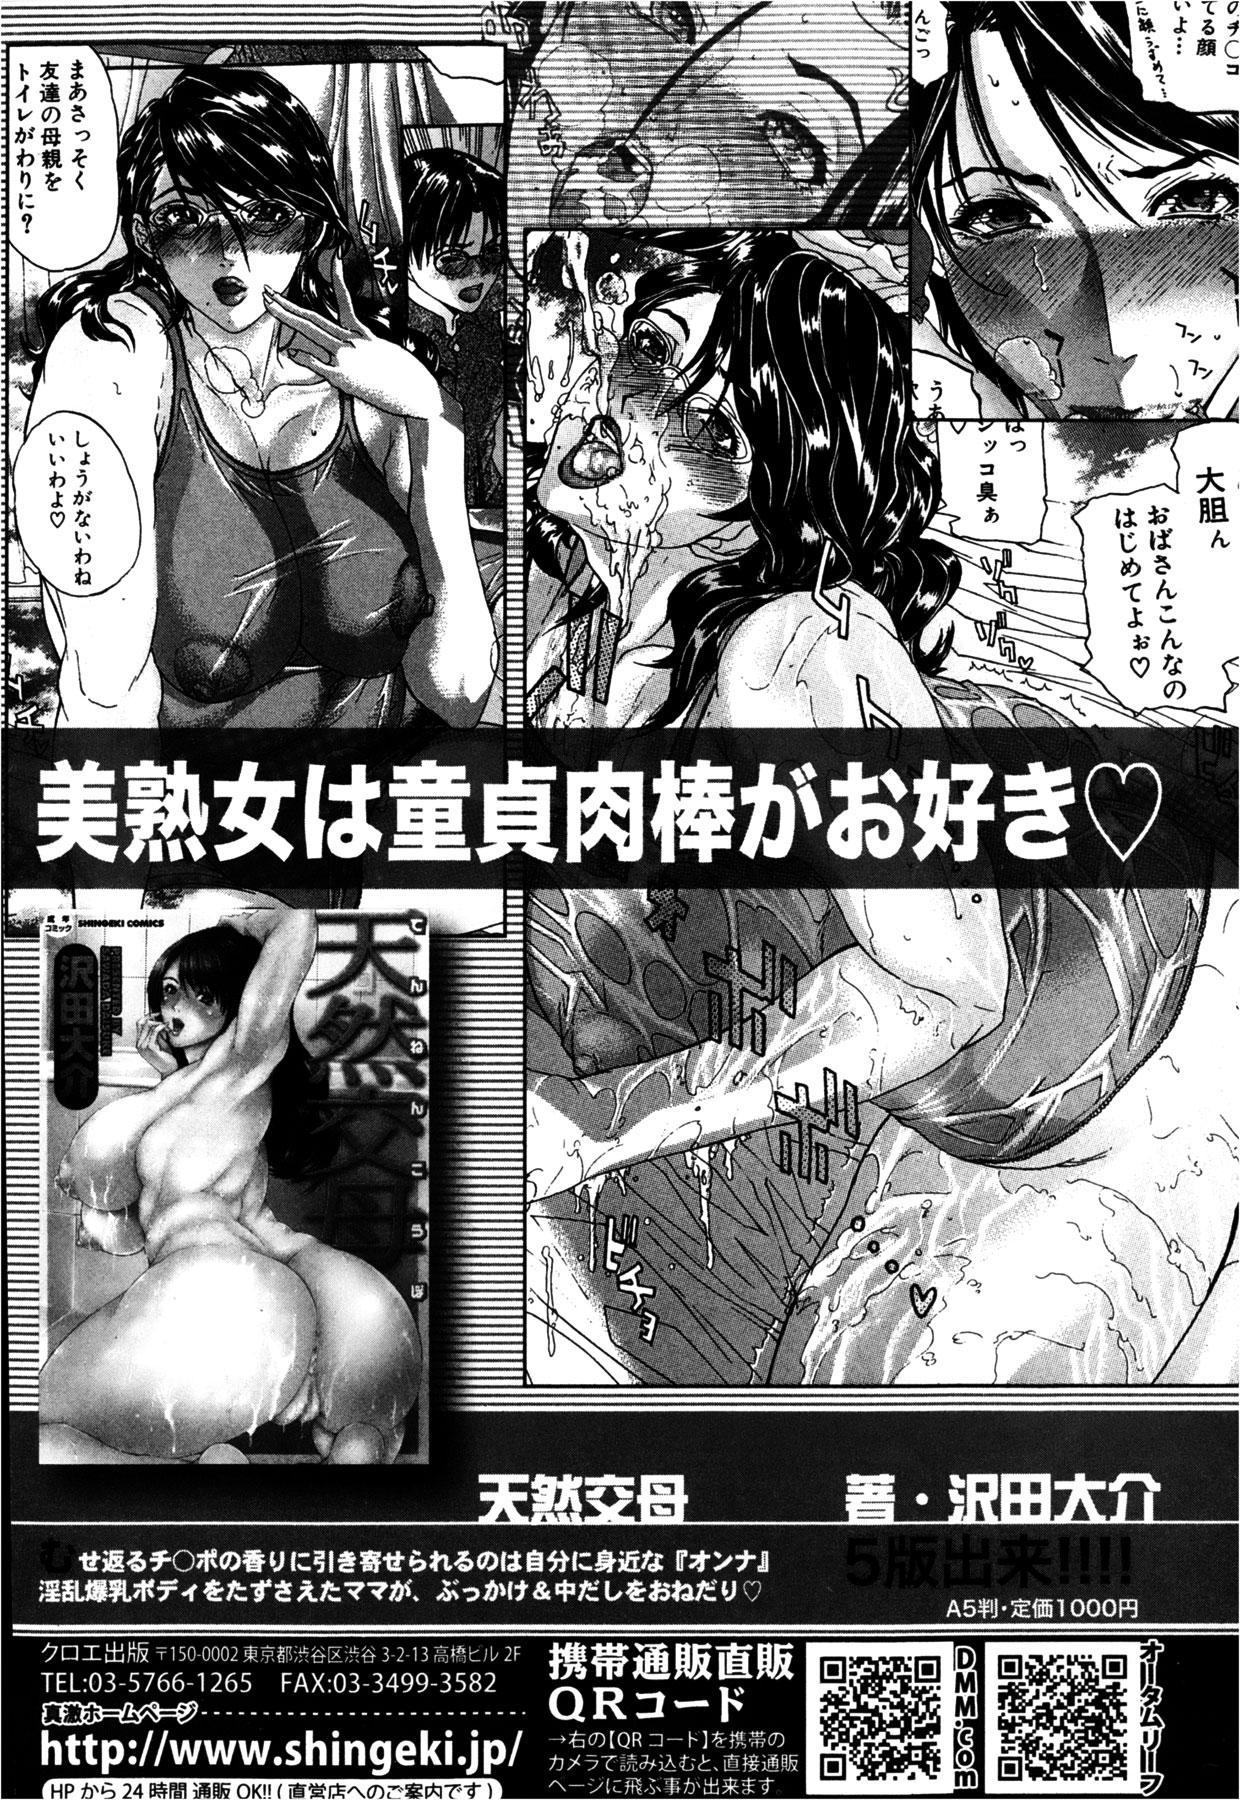 COMIC Shingeki 2013-02 165